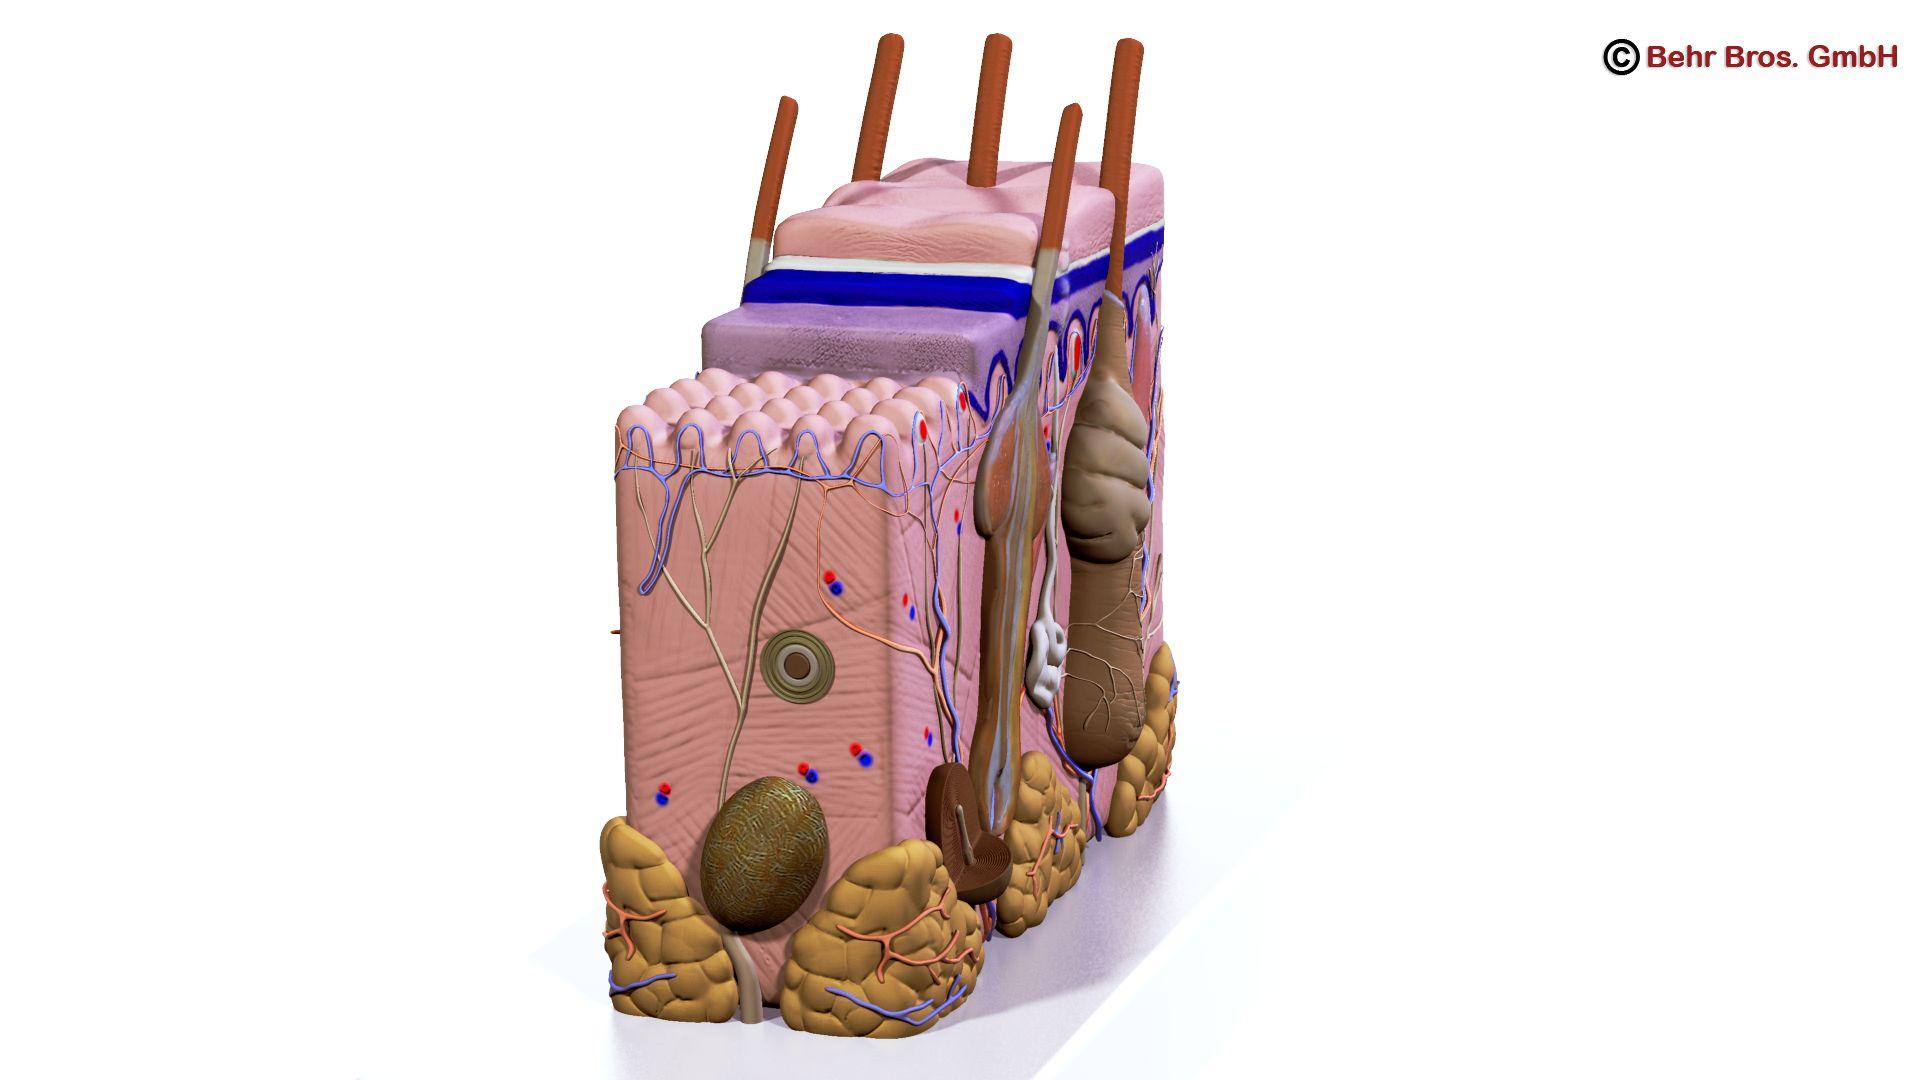 Human Skin Section 3d model 3ds max fbx c4d lwo lws lw ma mb obj 161730